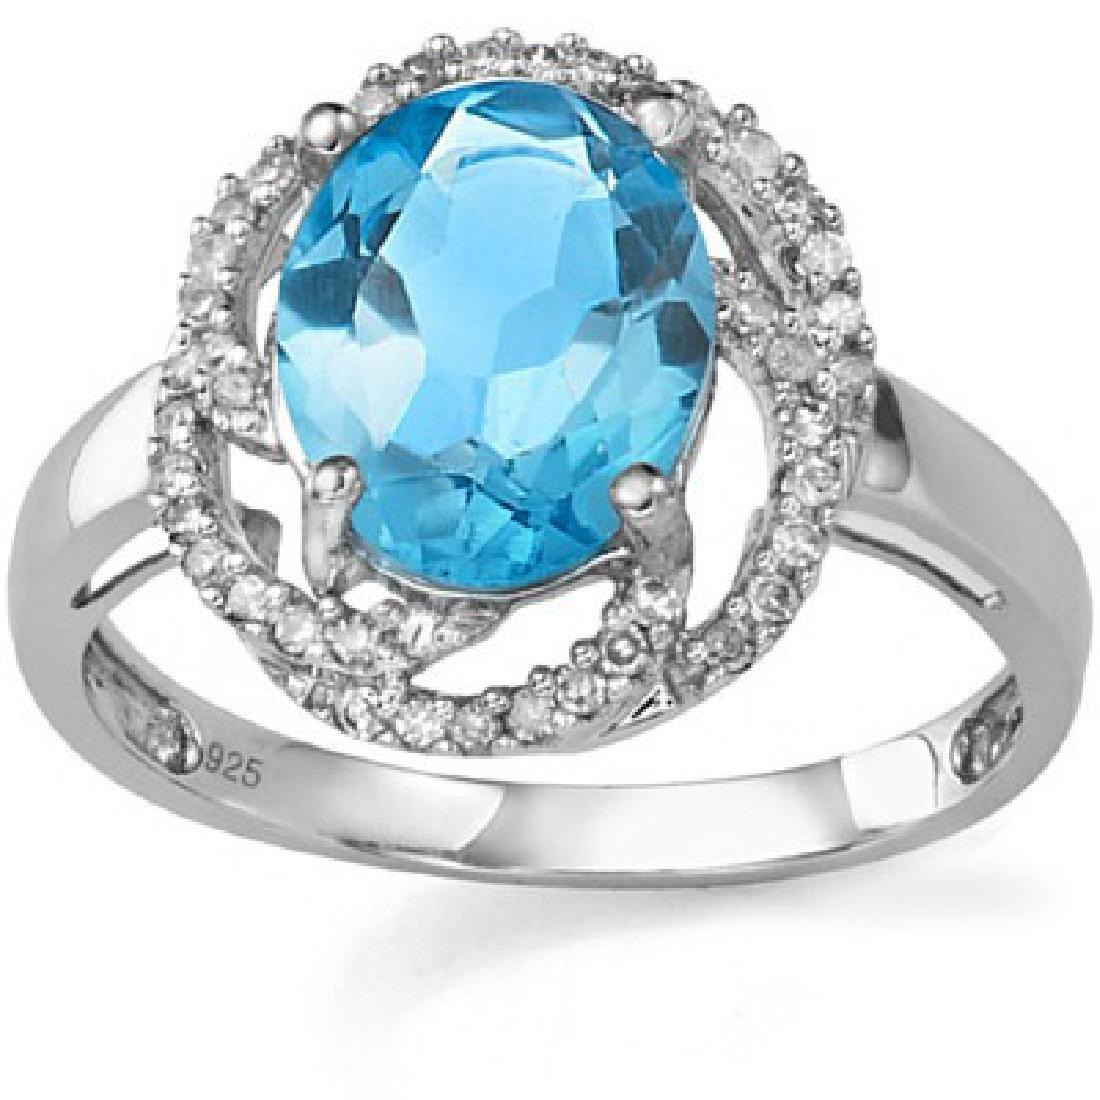 3.16 CT BLUE TOPAZ & 2 PCS WHITE DIAMOND PLATINUM OVER